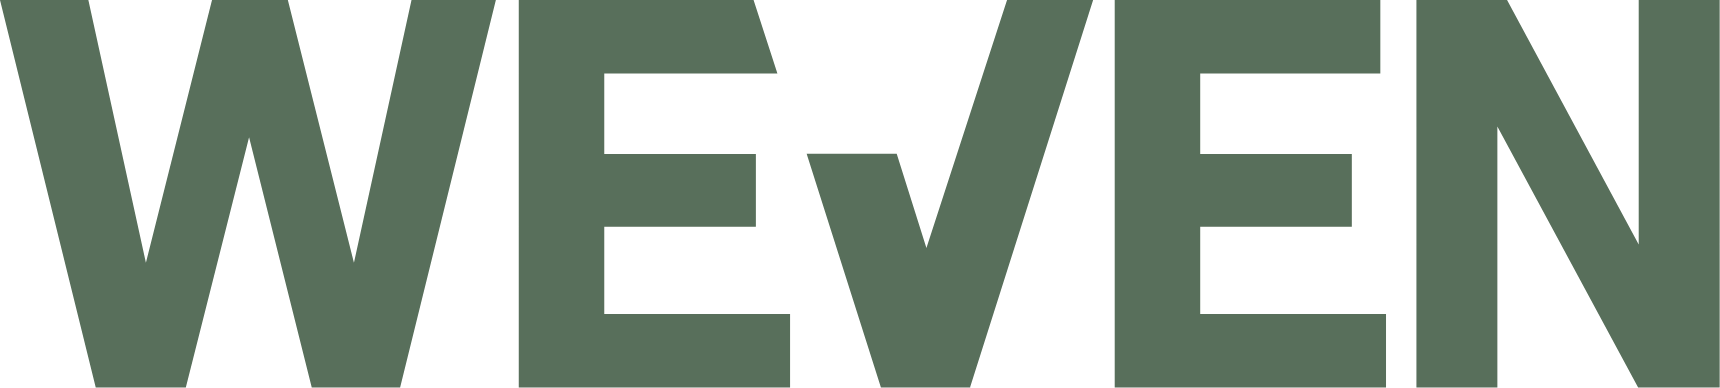 Weven Blog